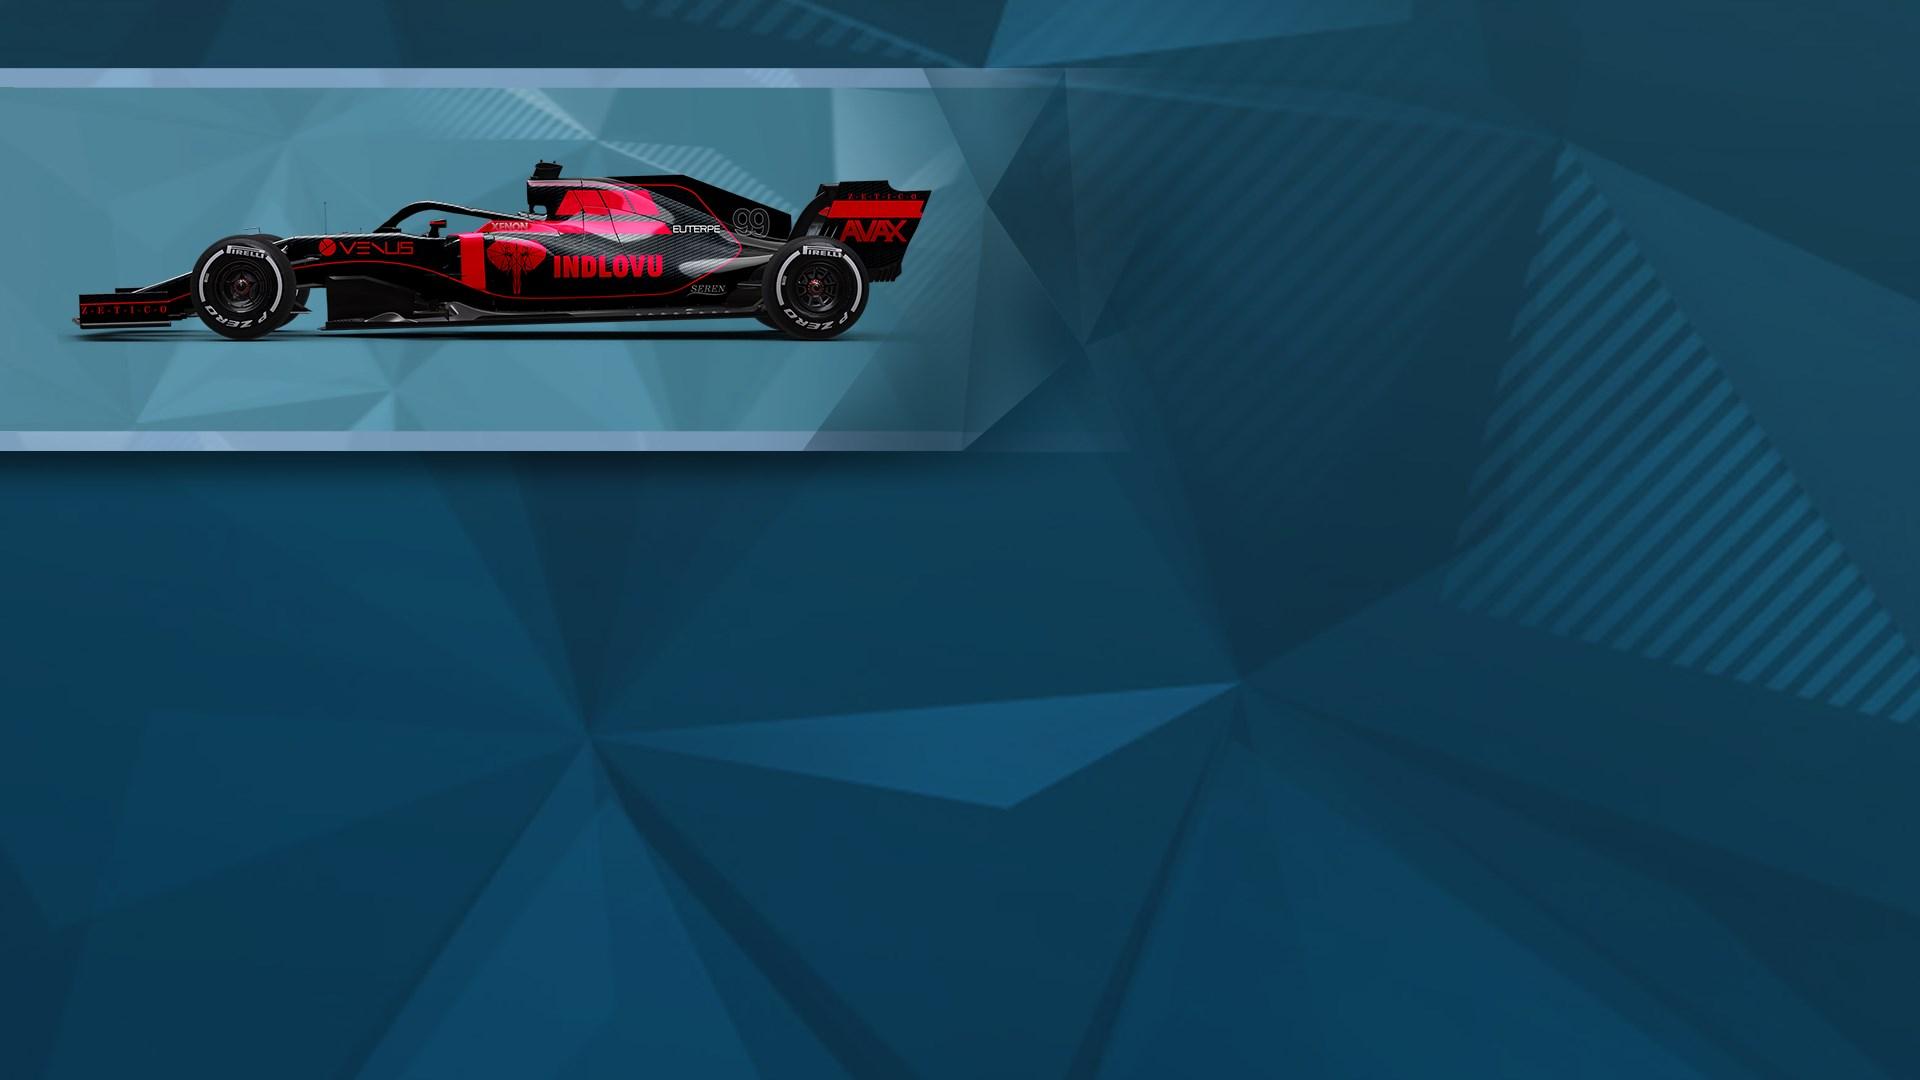 F1® 2019 WS: Car Livery 'INDLOVU - Outline'